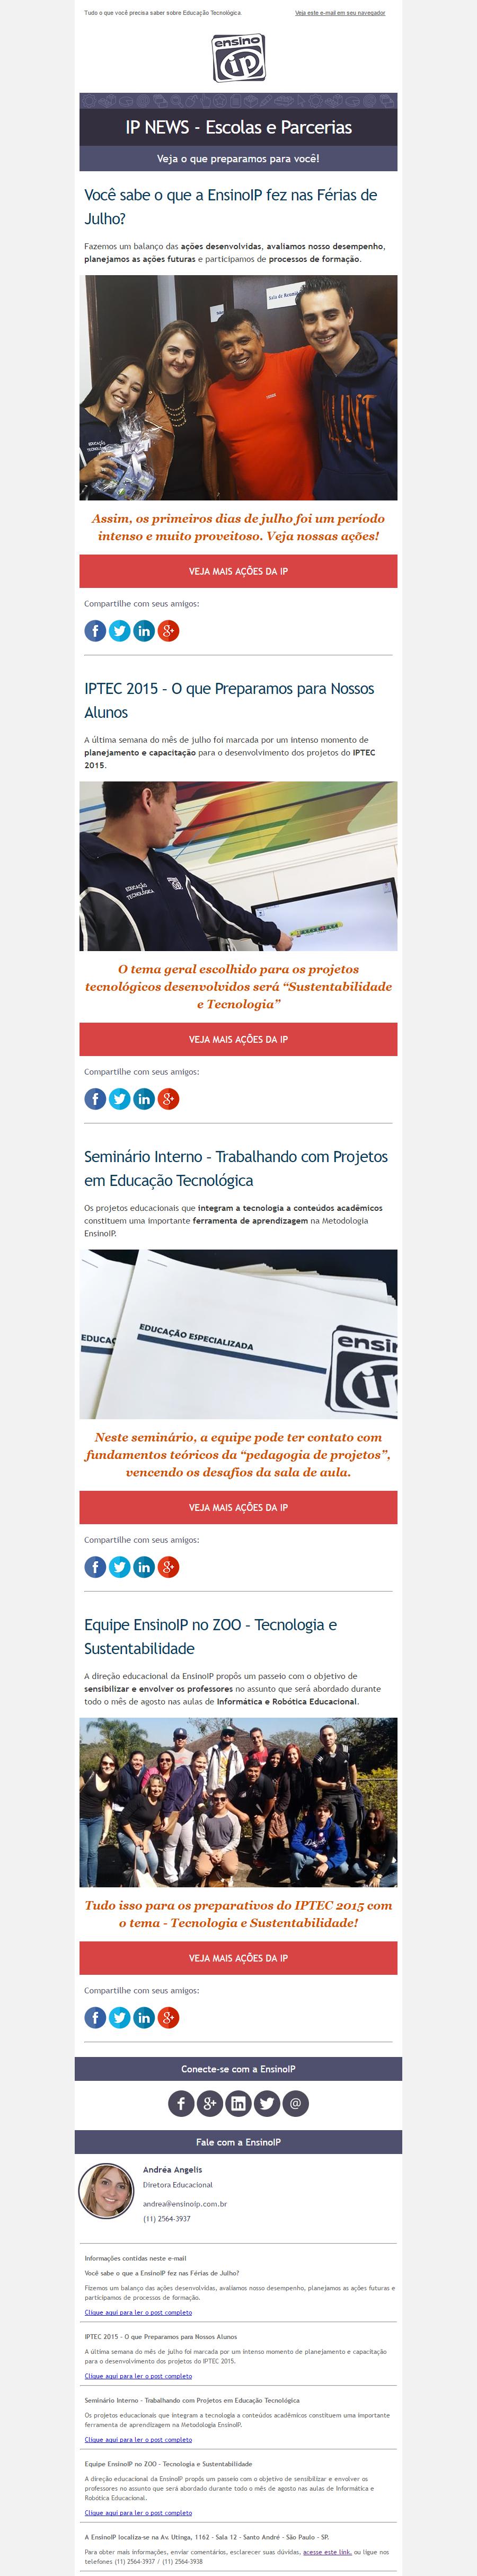 e-mail marketing newsletter Illustrator photoshop css HTML